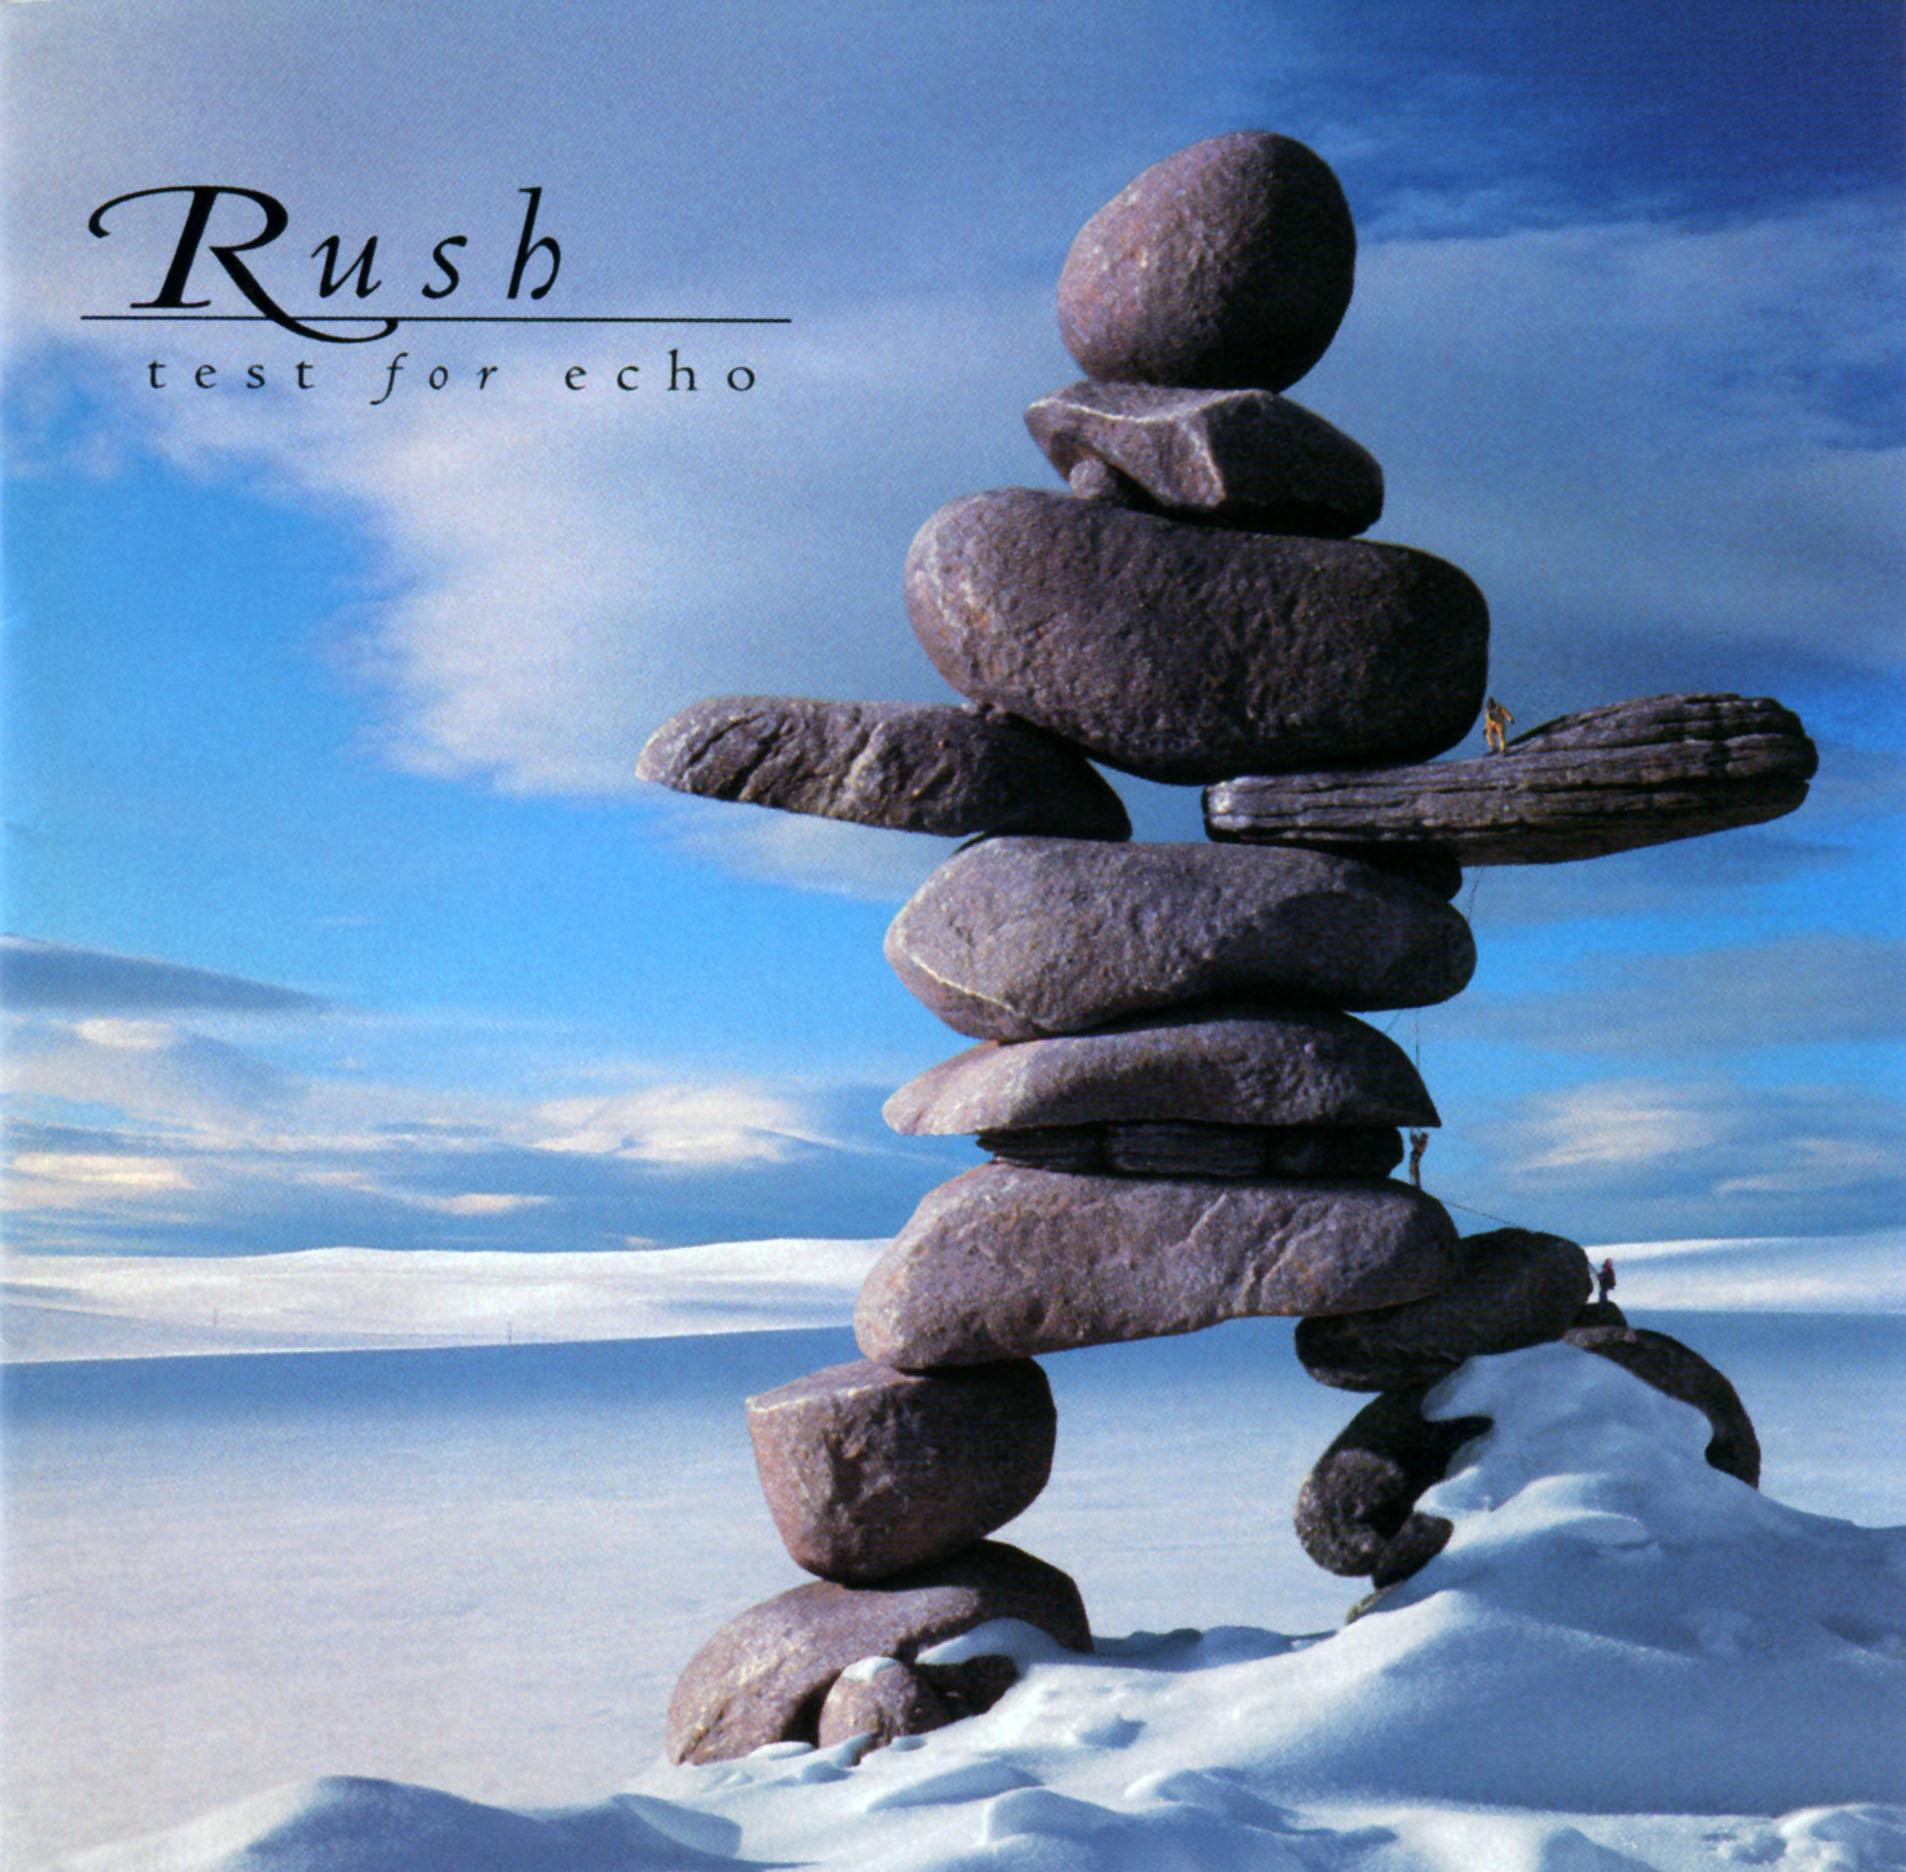 Rush 39 test for echo 39 album review - Rush album covers ...